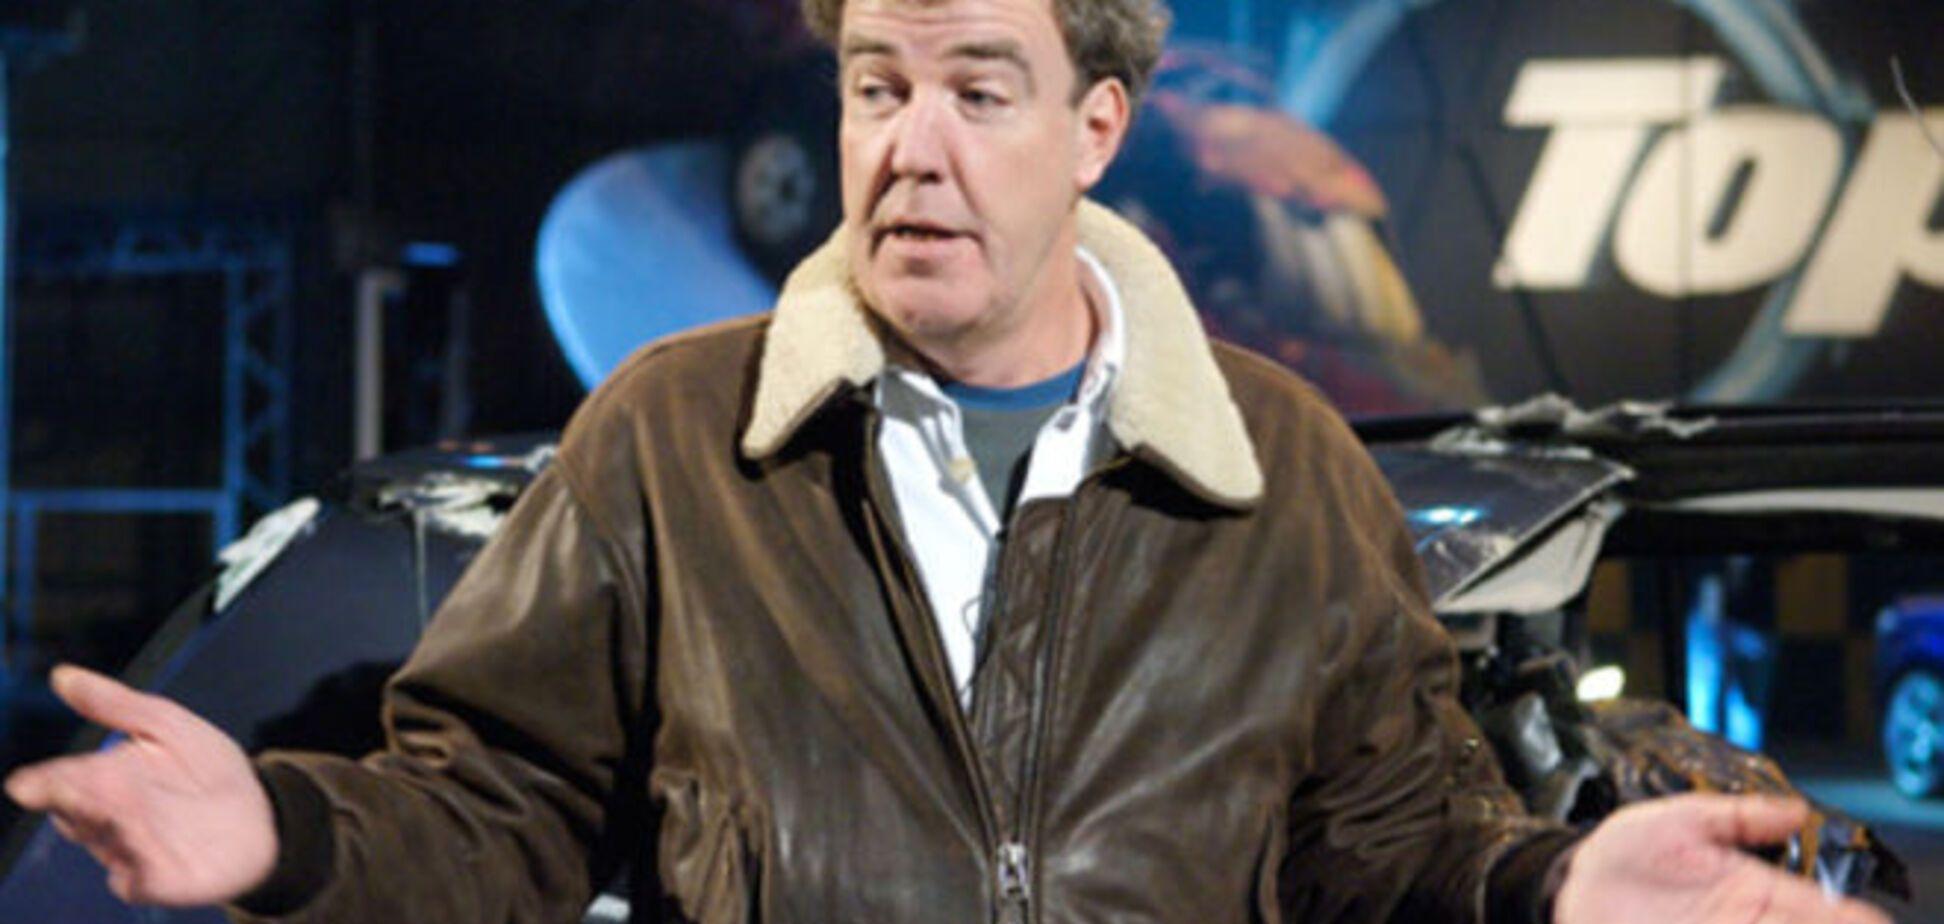 Легендарного ведучого Top Gear Джеремі Кларксона образили 'педофілом'